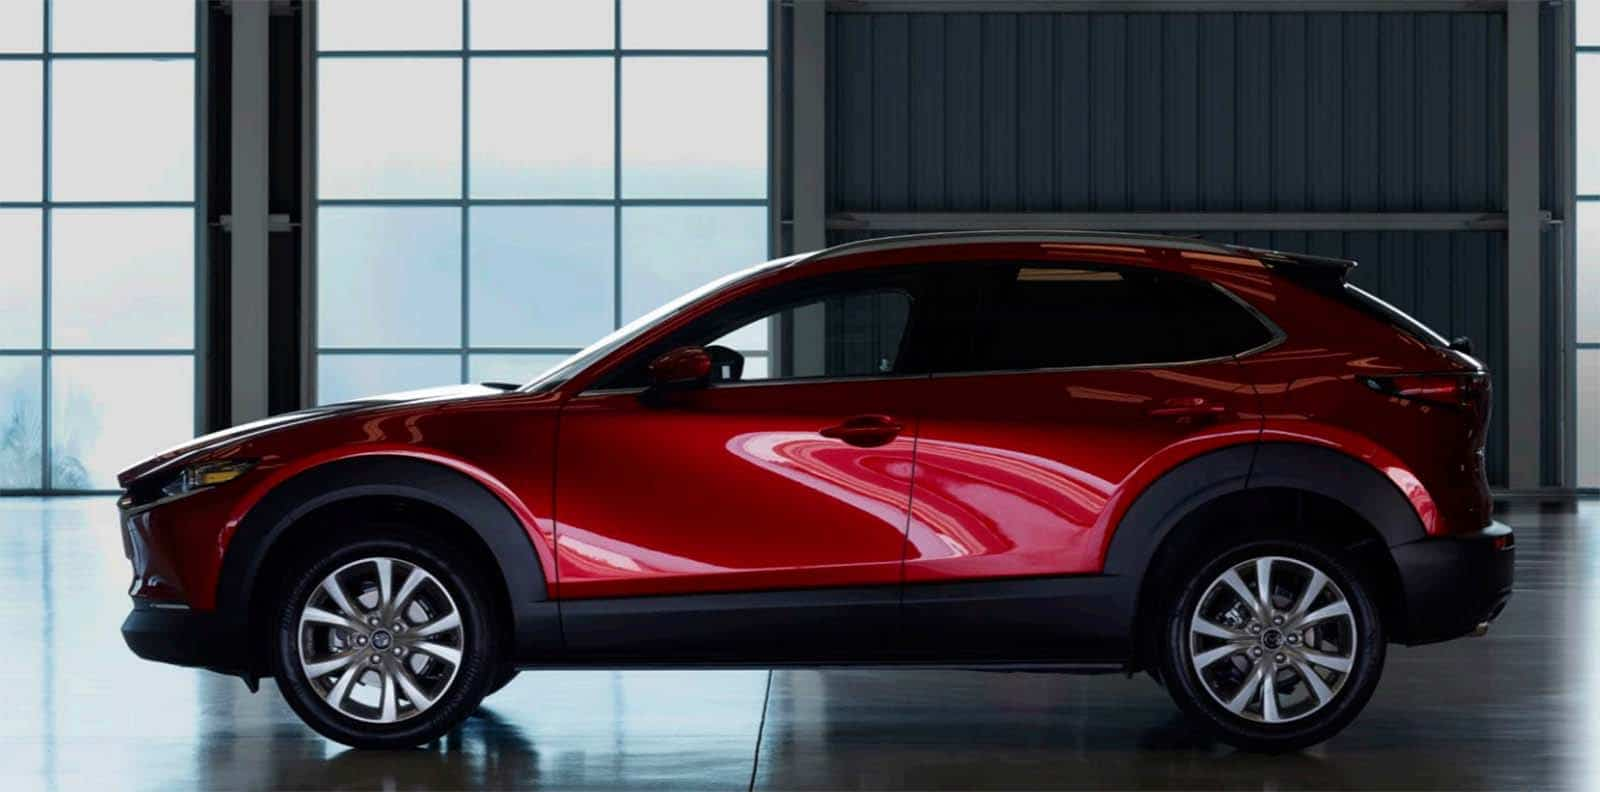 First Drive: 2020 Mazda CX-30   TheDetroitBureau.com